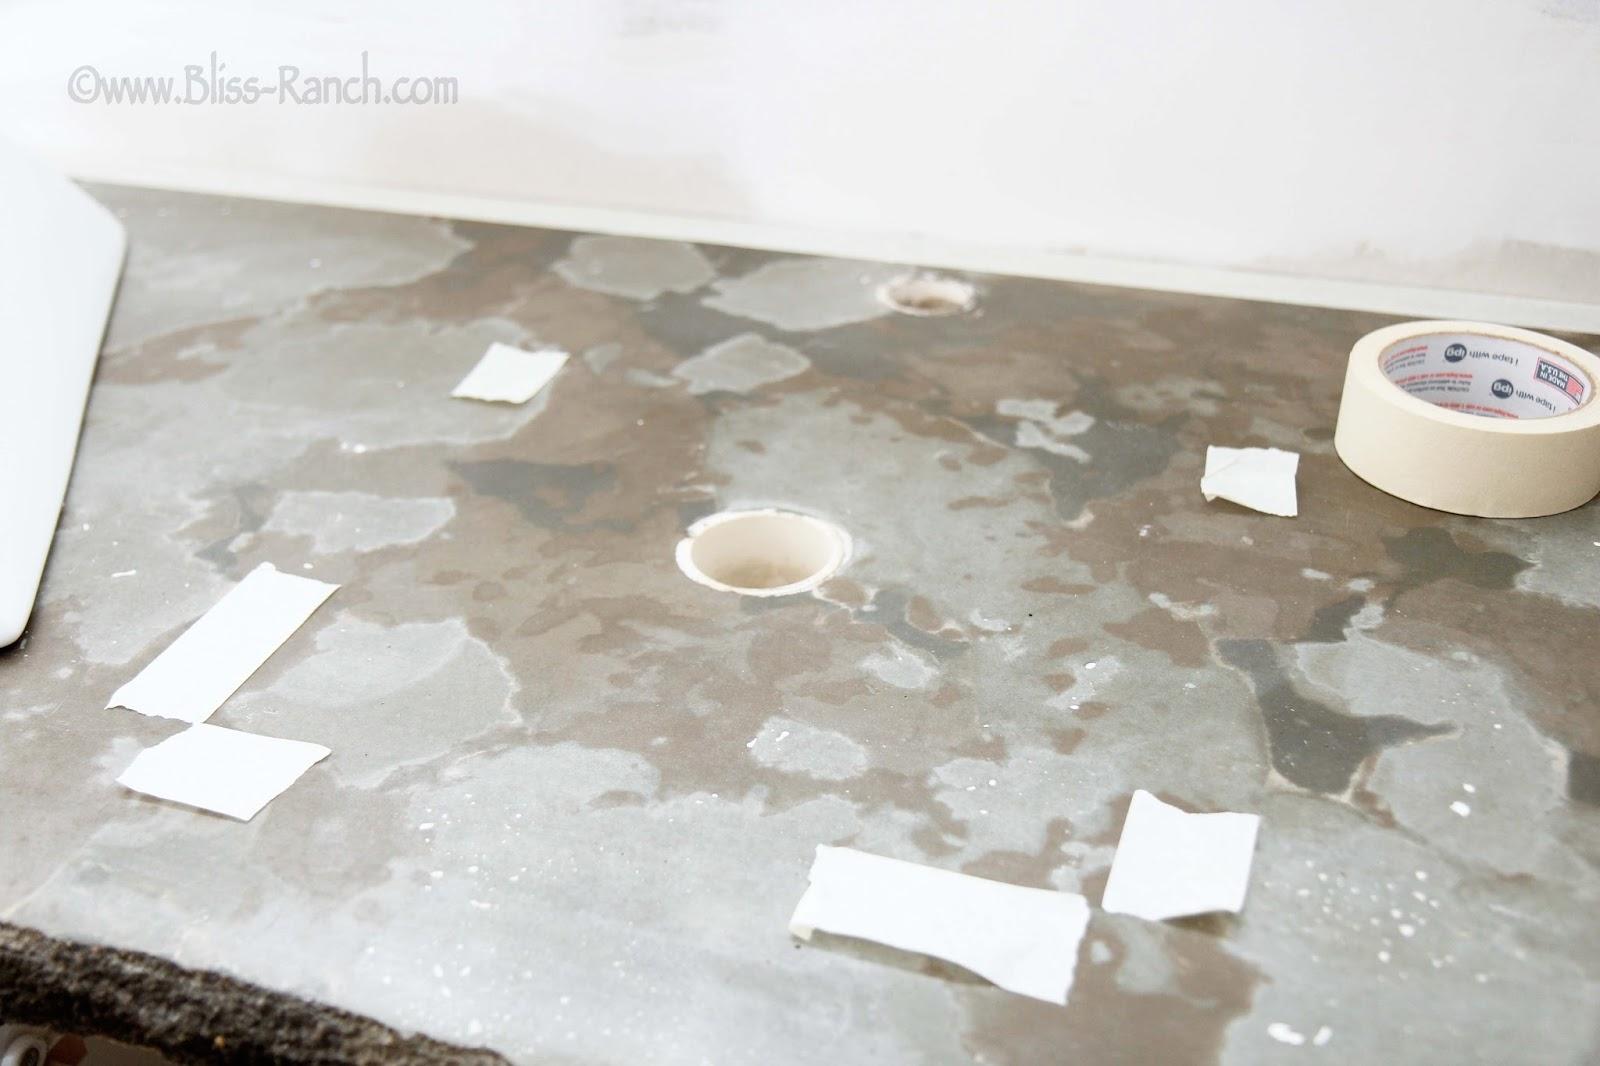 Poured Concrete Counter Bliss-Ranch.com